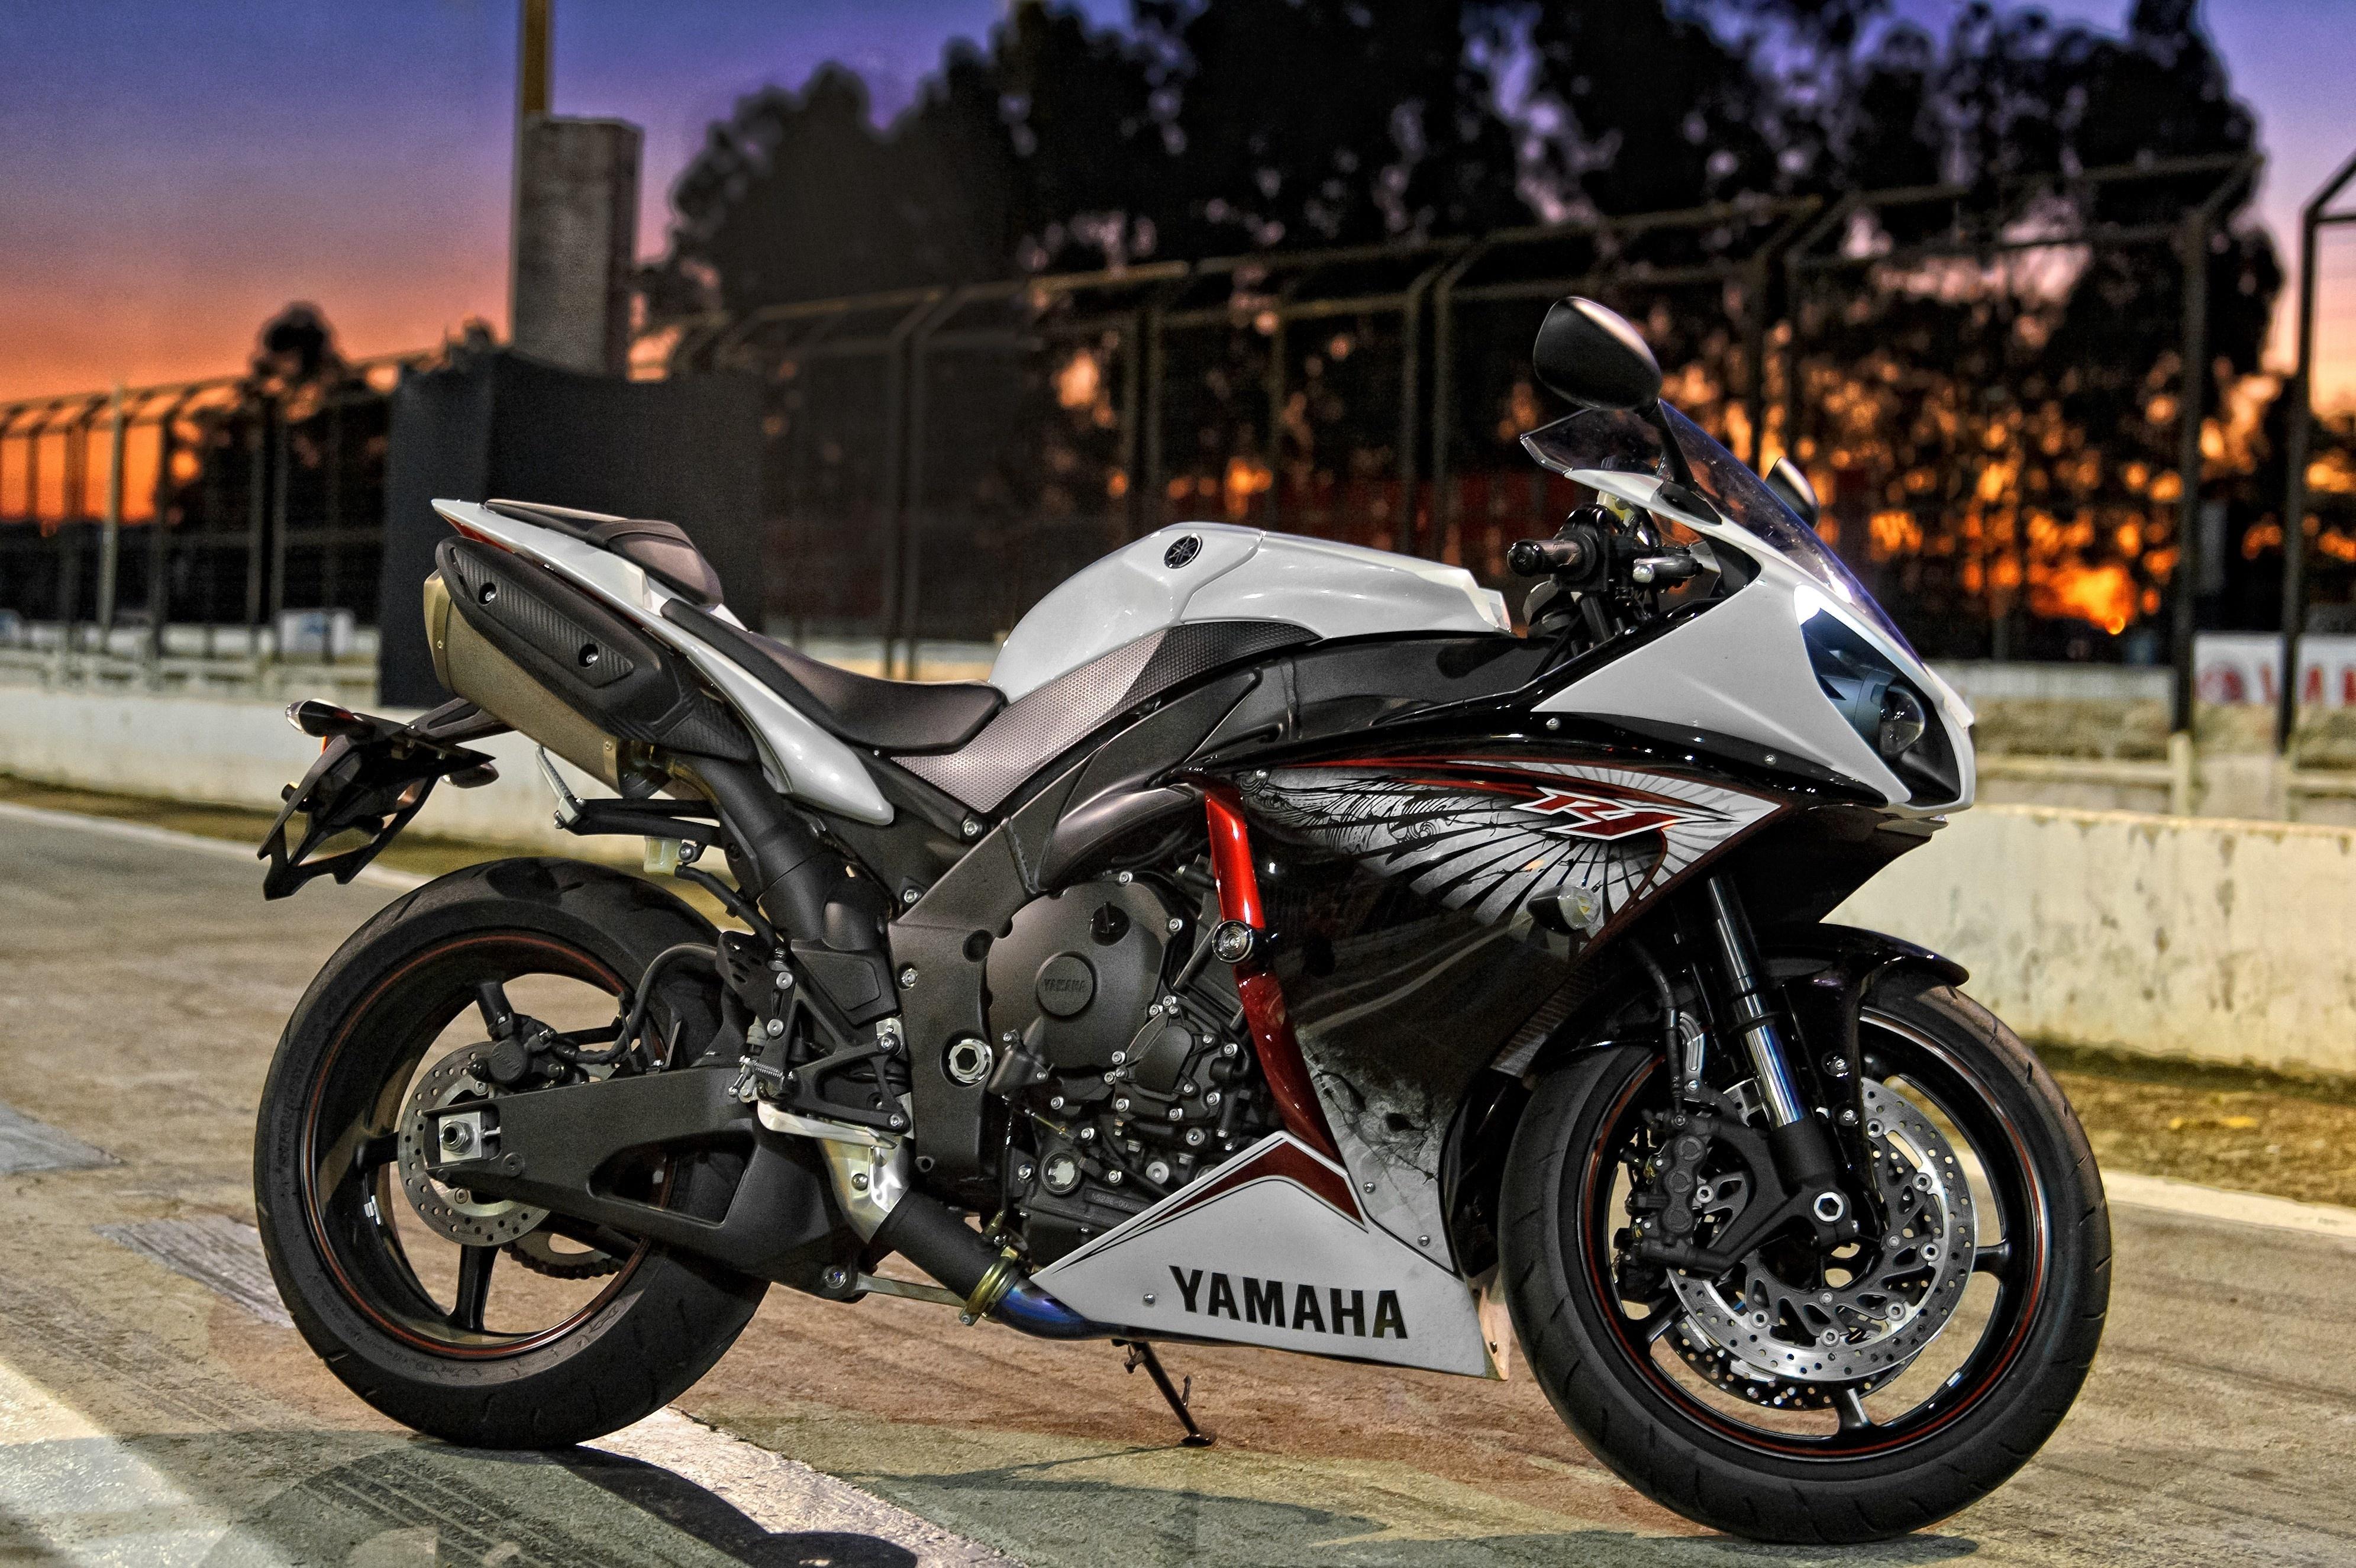 ямаха мотоциклы официальный сайт 5